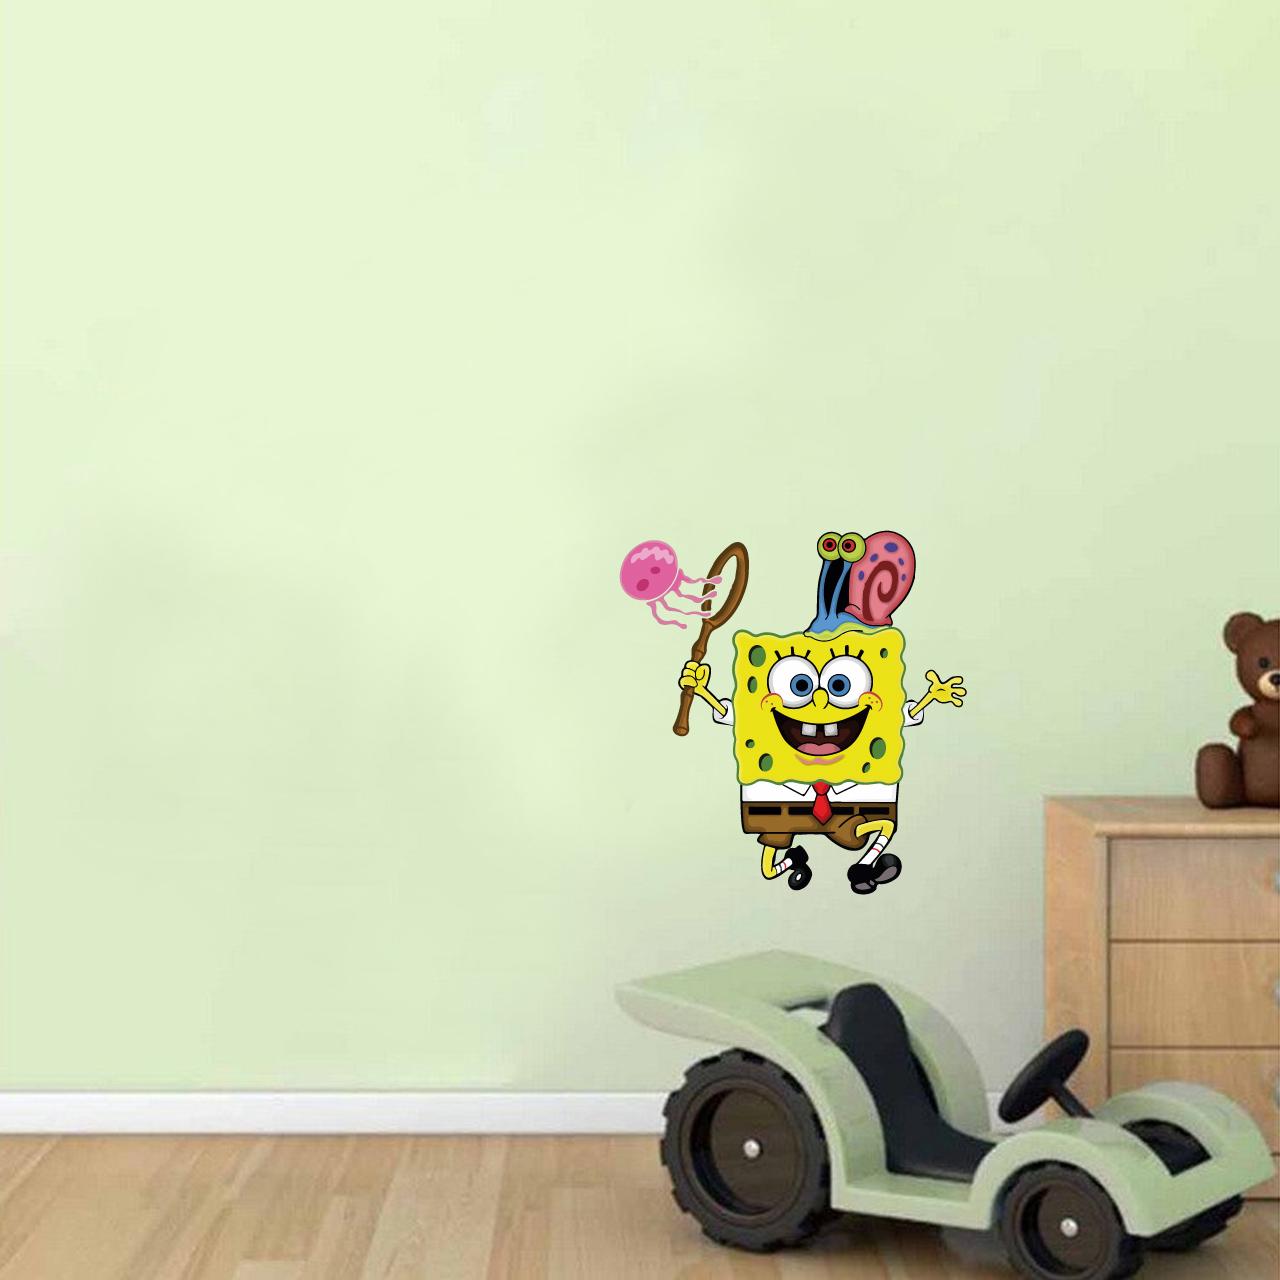 استیکر دیواری کودک هفال طرح باب اسفنجی و یوگی کد H79